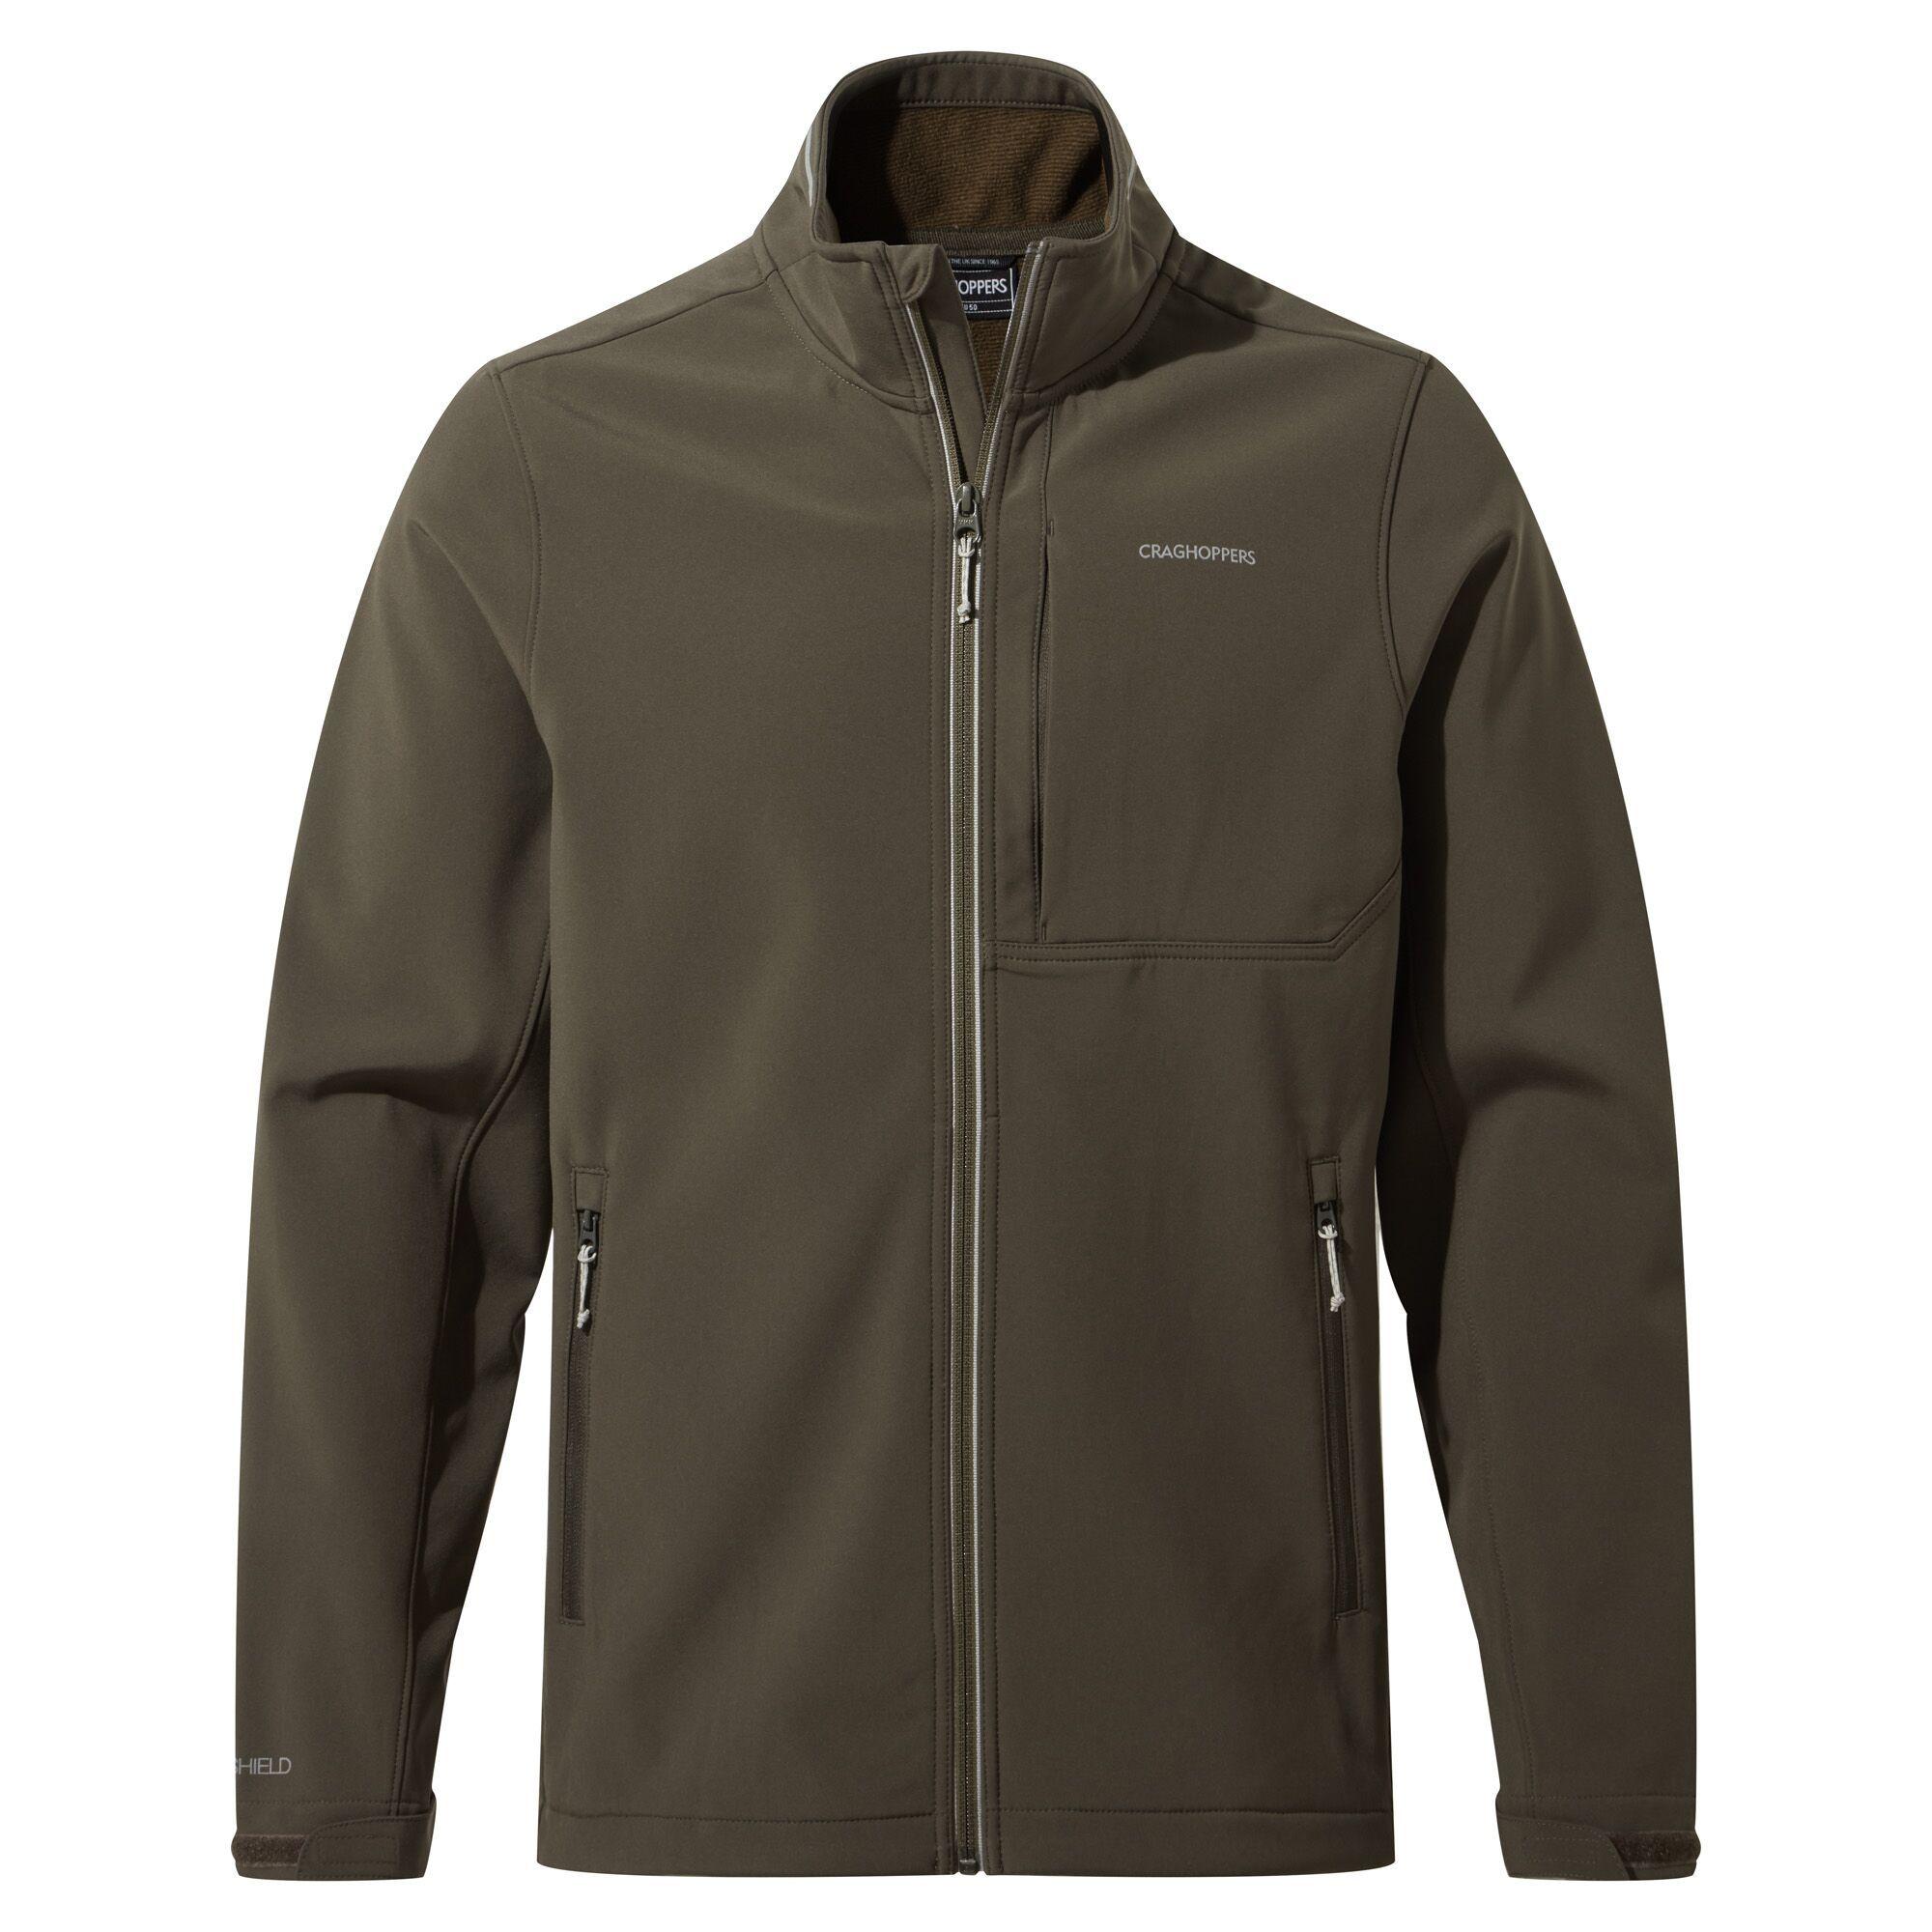 Craghoppers Mens Altis Jacket (XL) (Woodland Green)